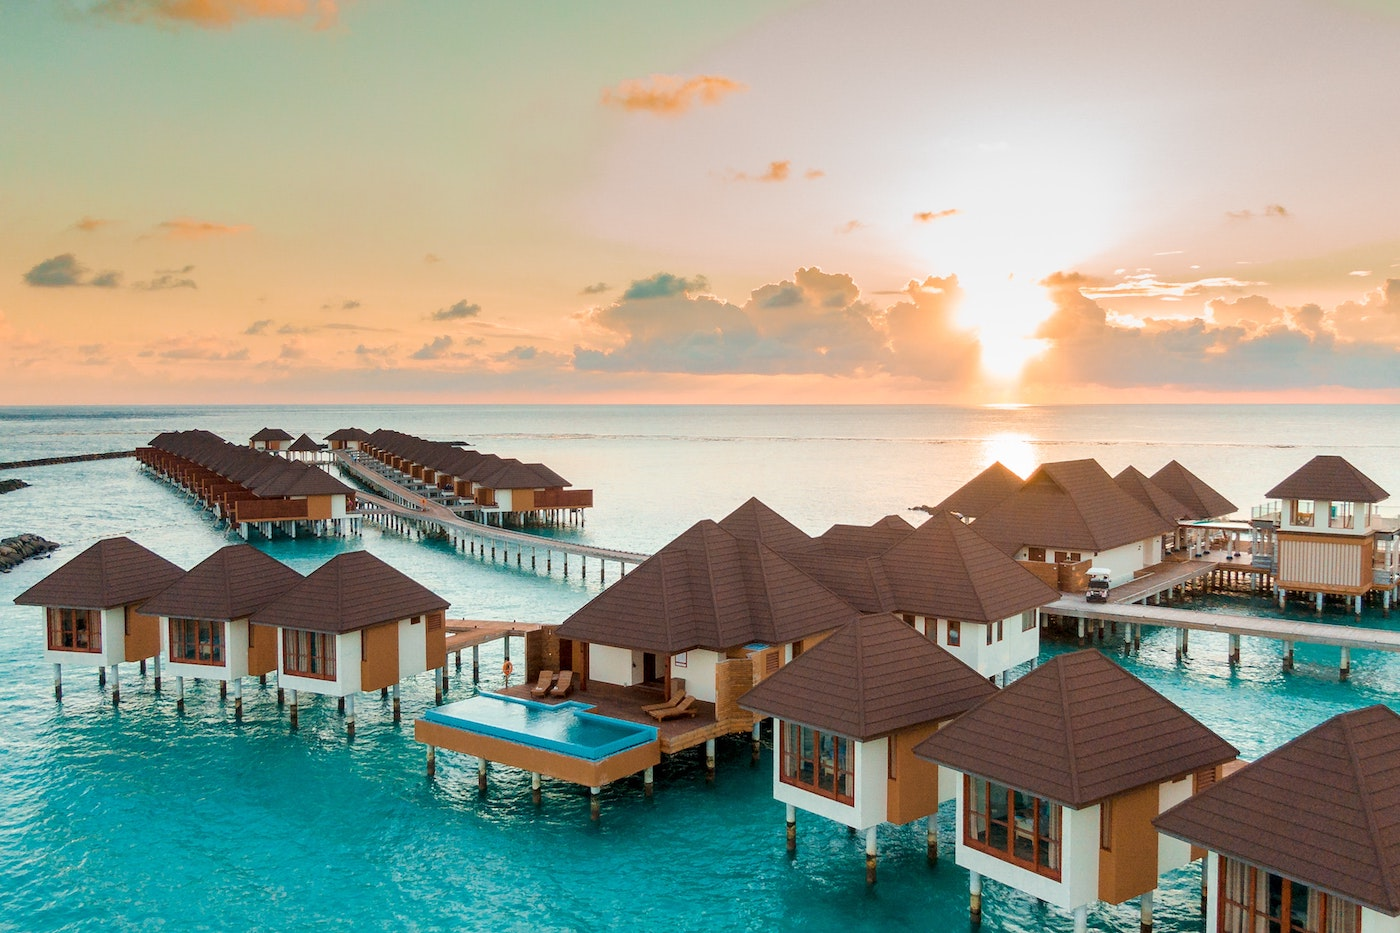 Malediven Strand Traum Urlaubsort Flitterwochen Vibes